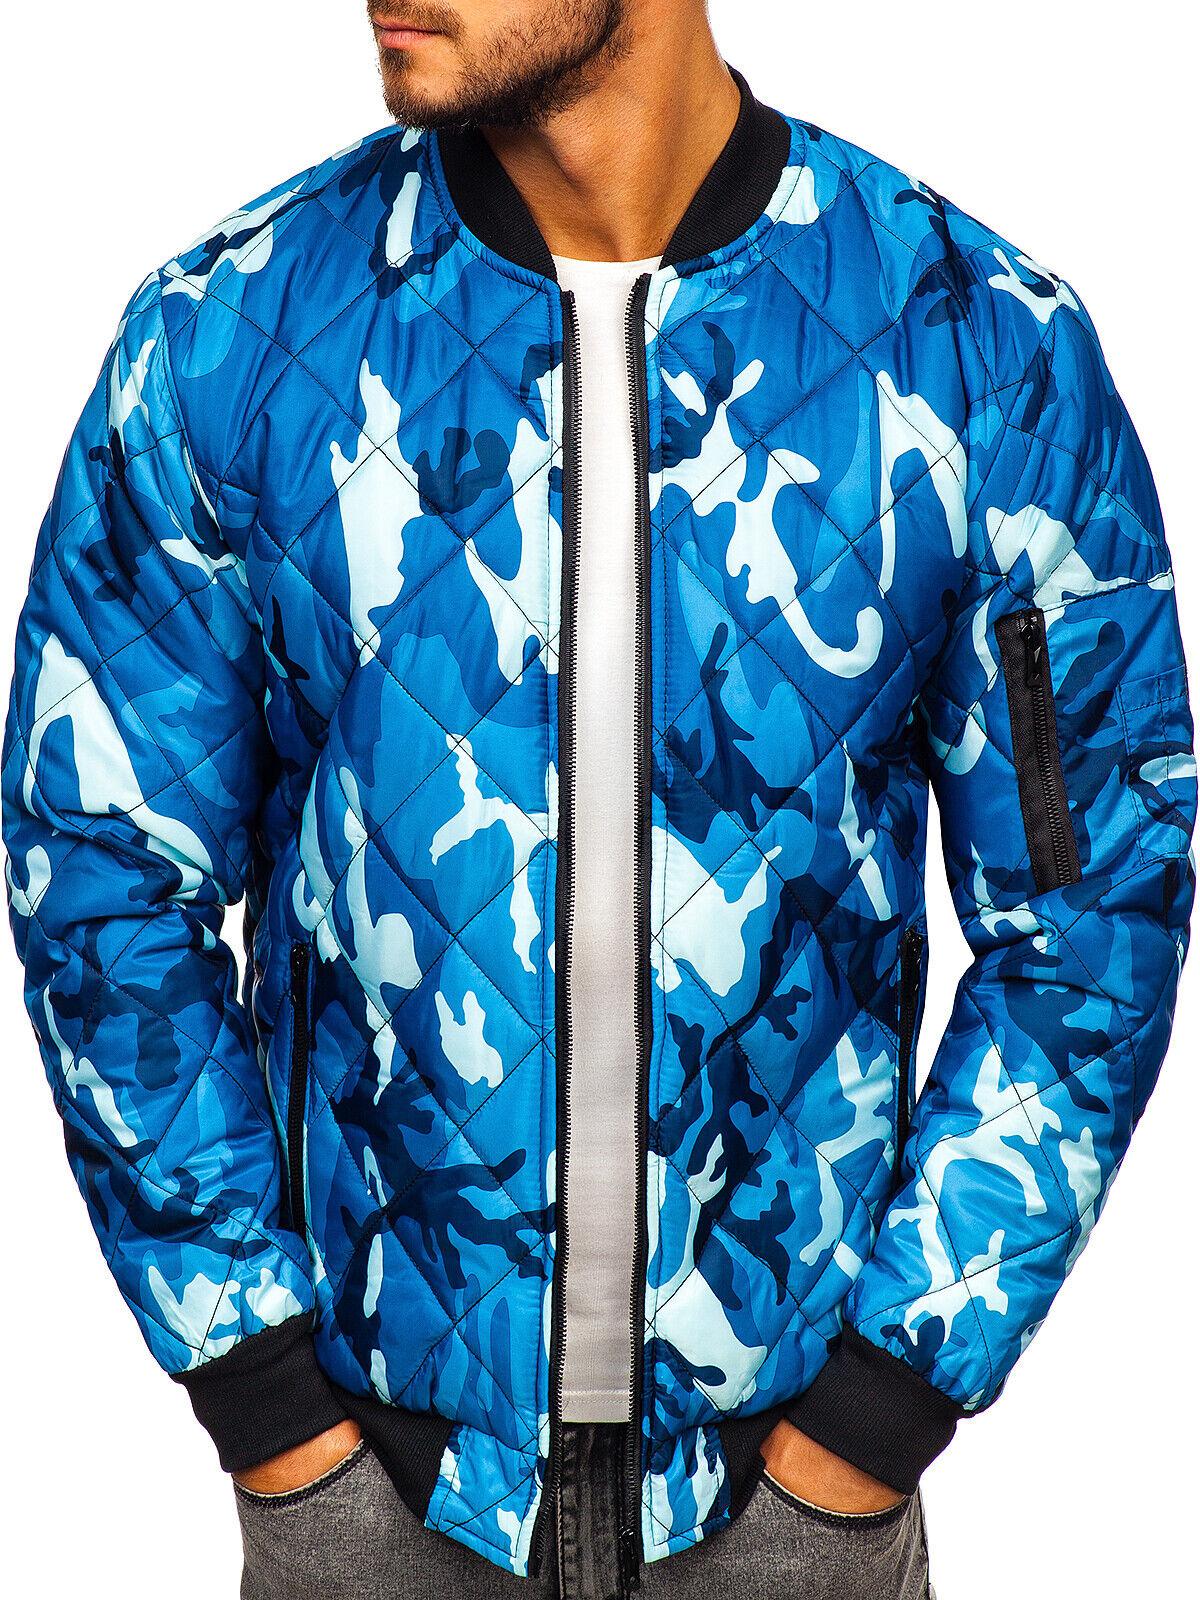 J.Style MY01 Blau